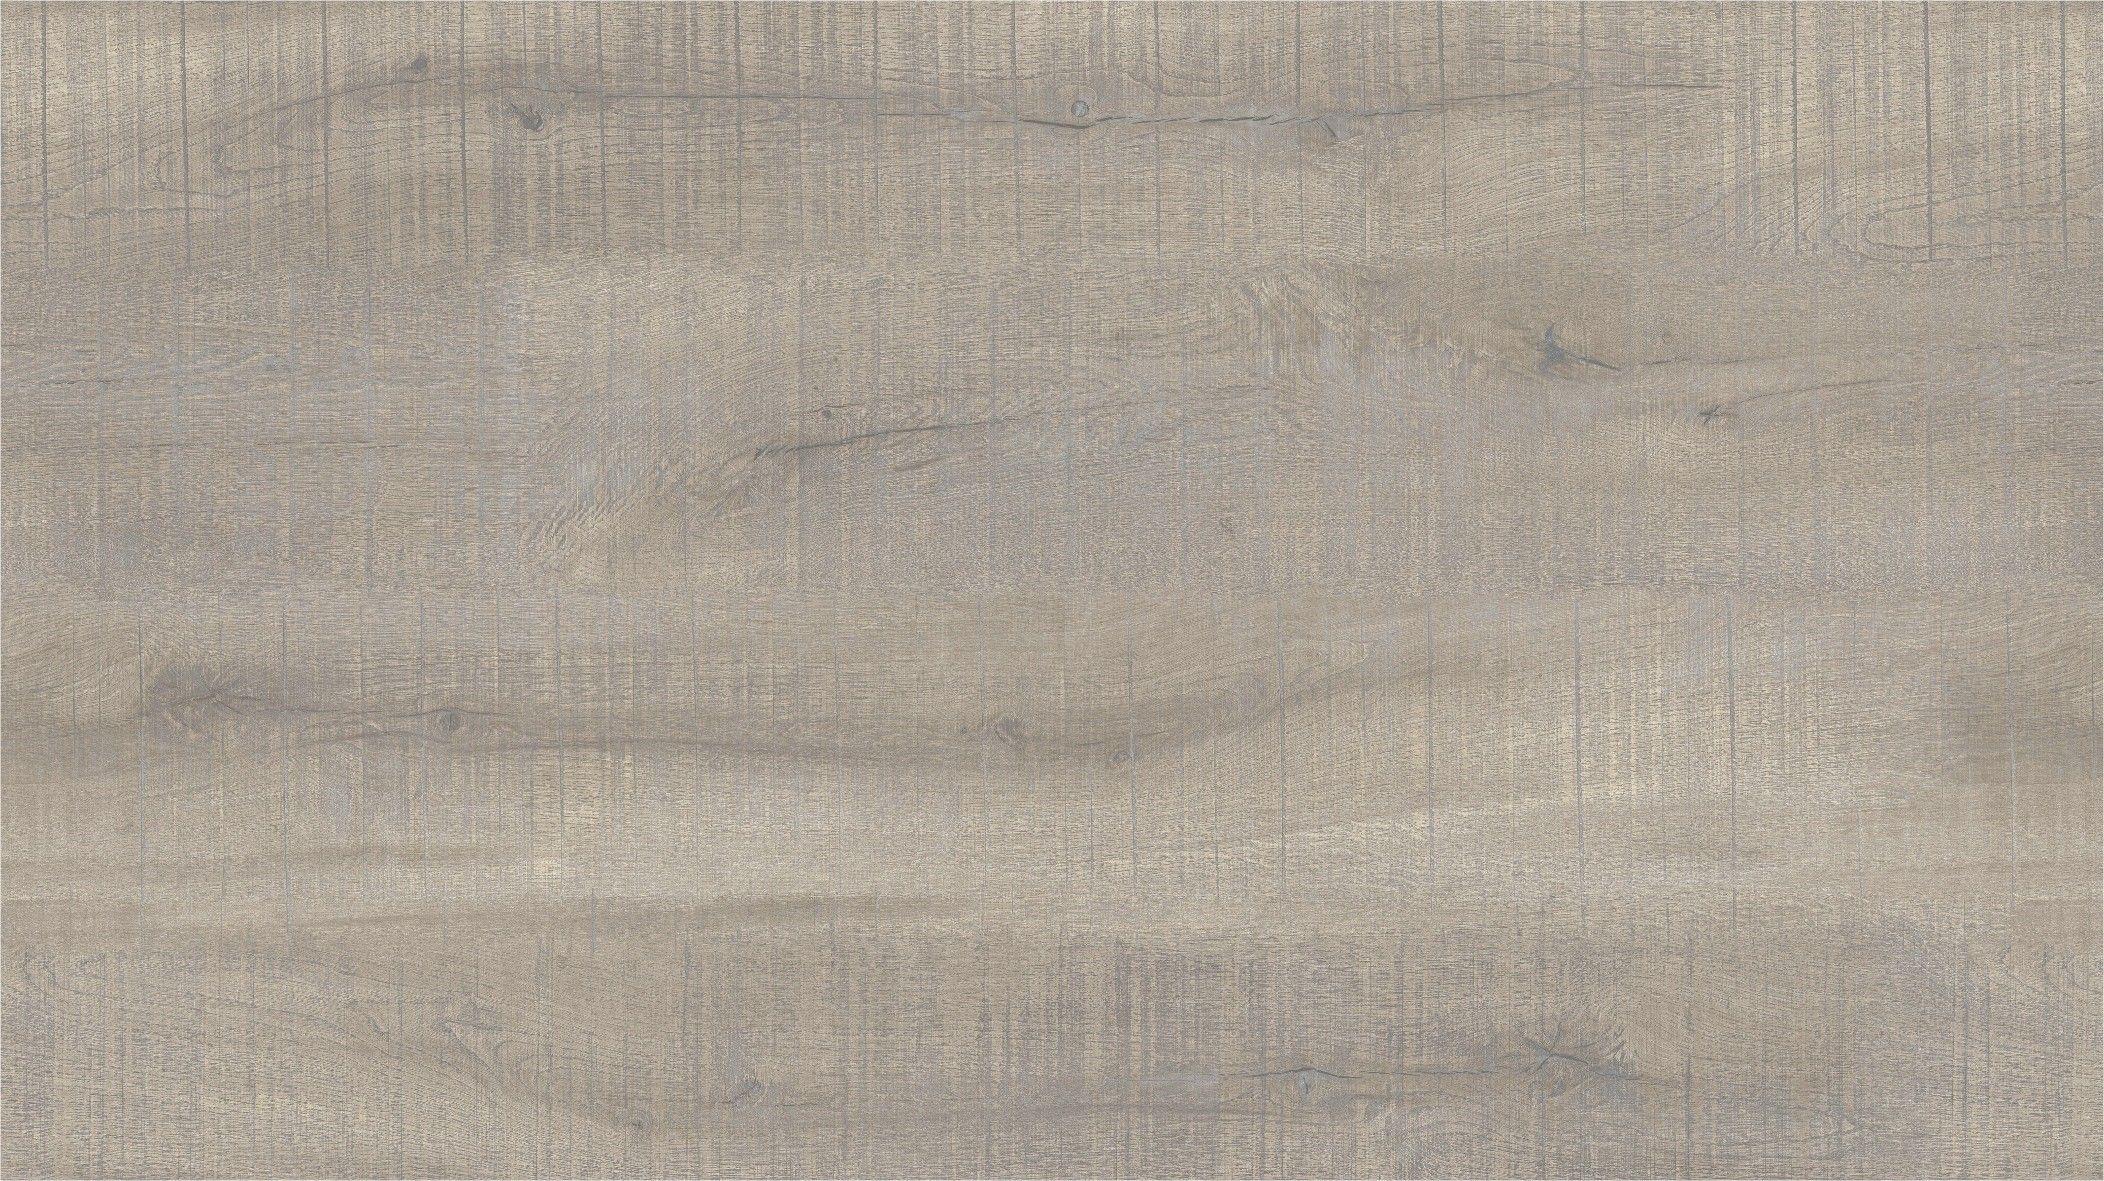 Allure Locking Gen 3 Sawcut Montana Vinyl Flooring Vinyl Flooring Vinyl Plank Flooring